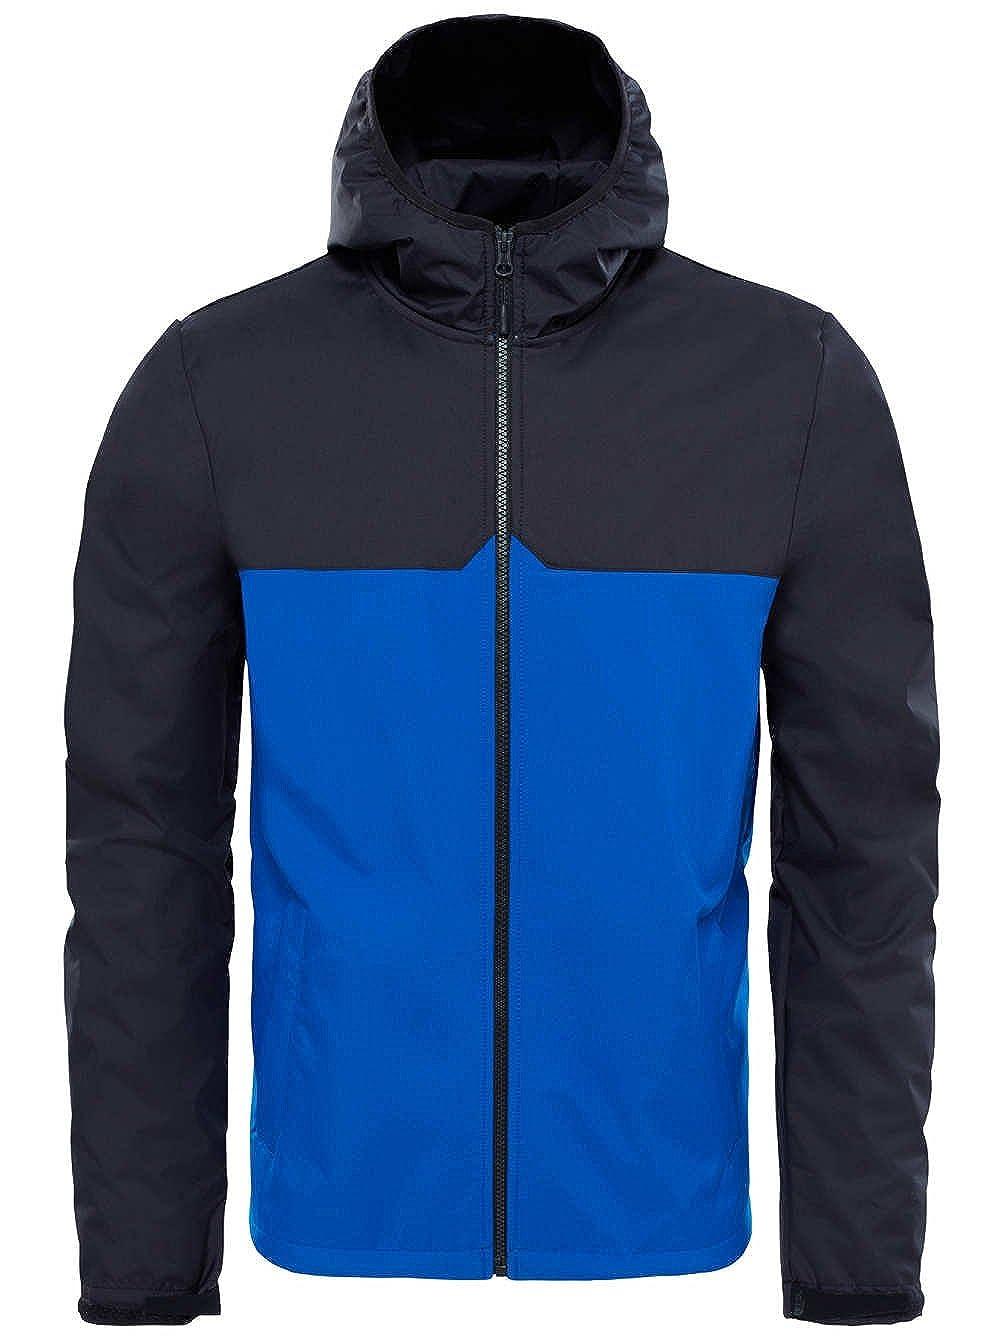 The North Face West Peak Softshell Tnfblack Brightcobaltblue XL  Amazon.it   Abbigliamento 2836f692597a